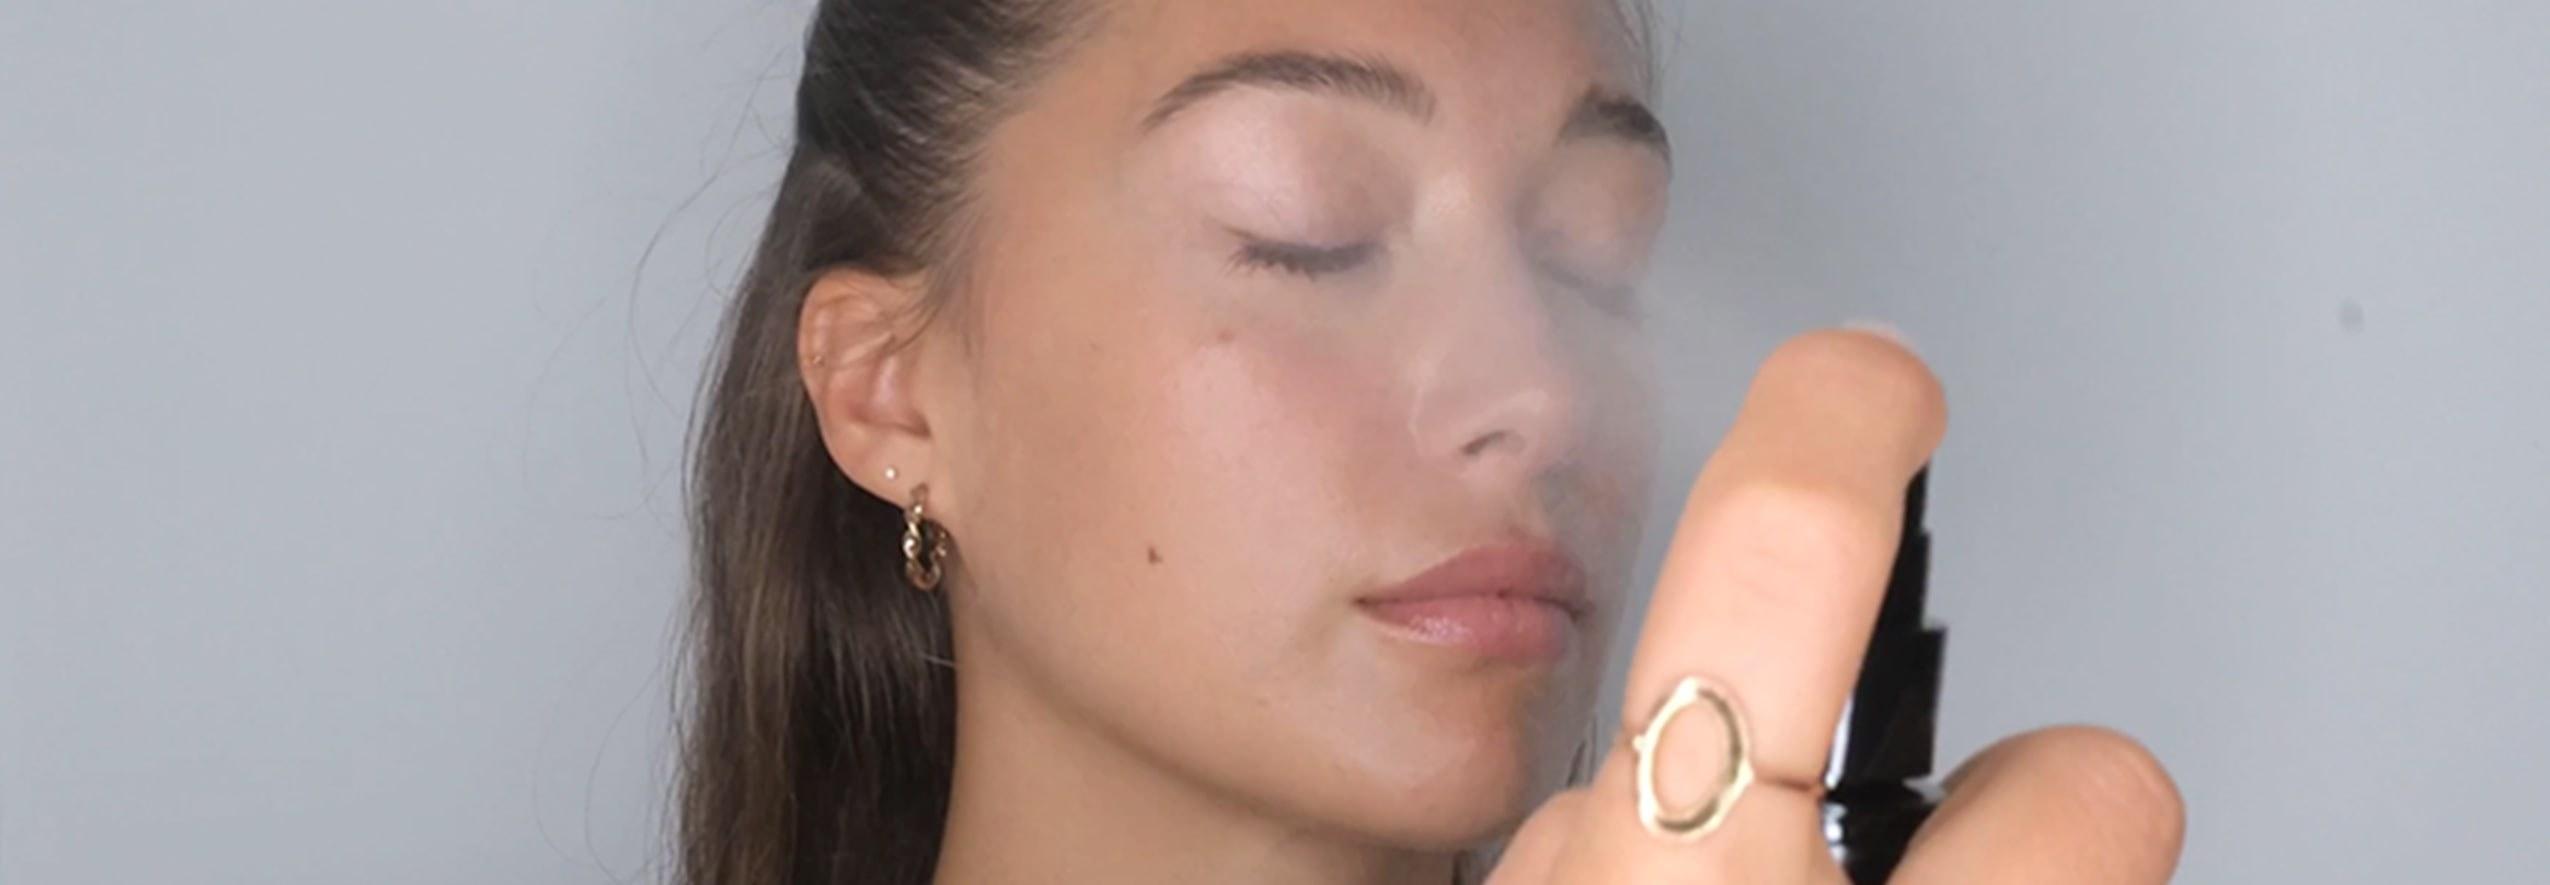 Use Lyma mist to reduce pigmentation